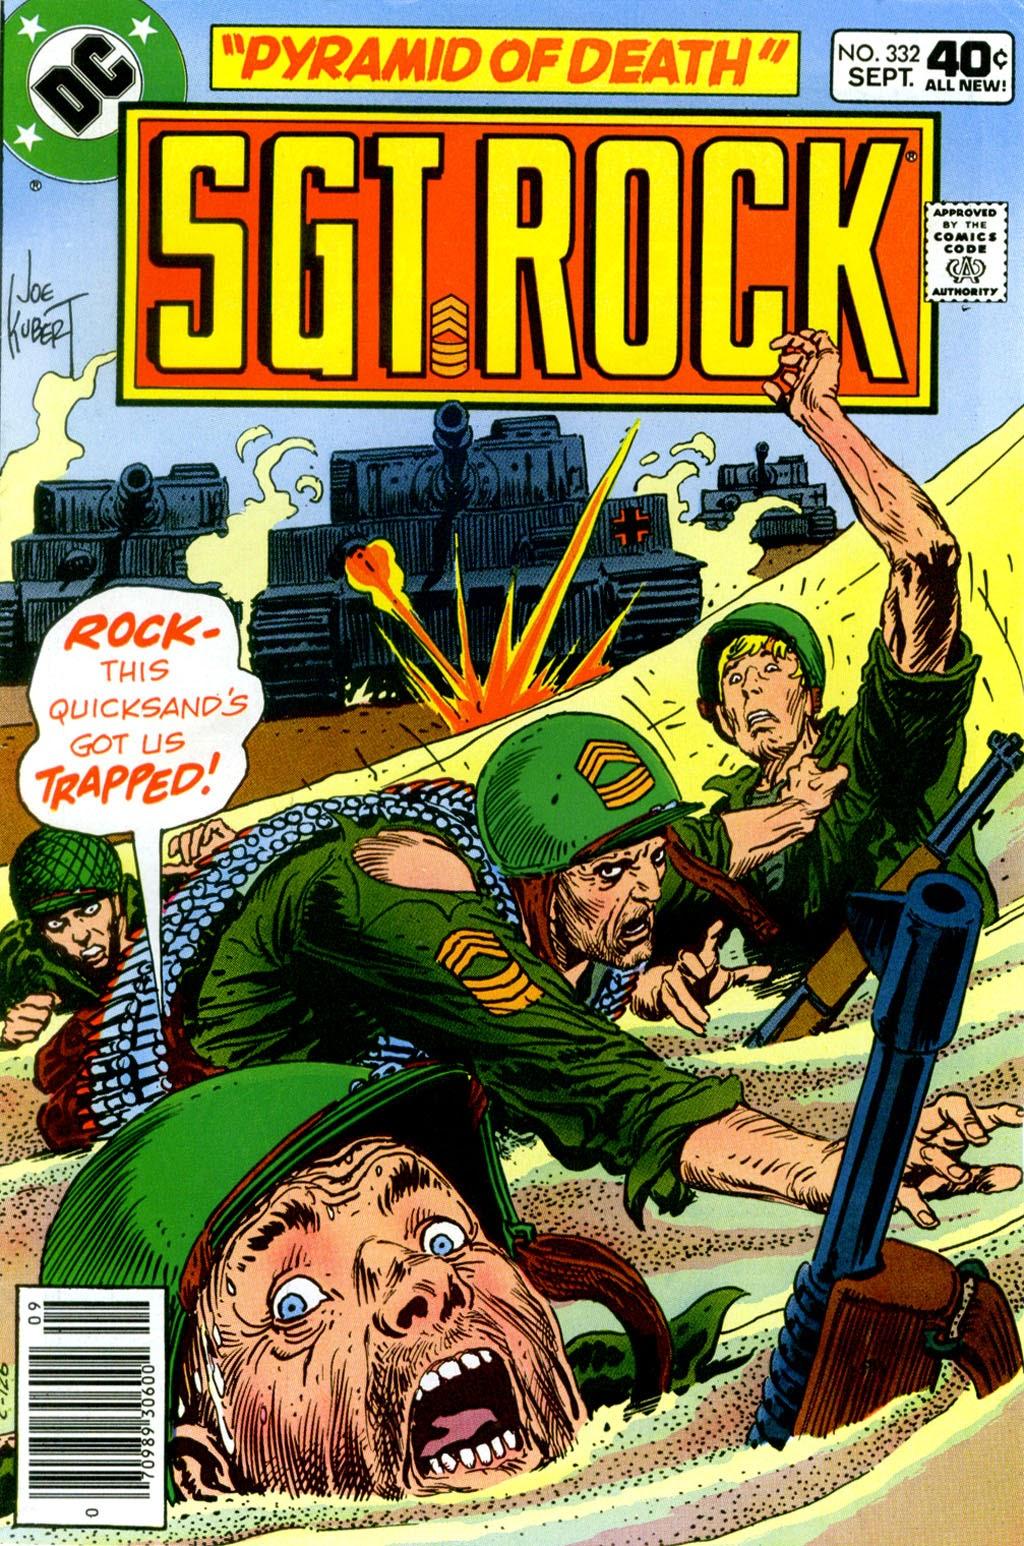 Read online Sgt. Rock comic -  Issue #332 - 1